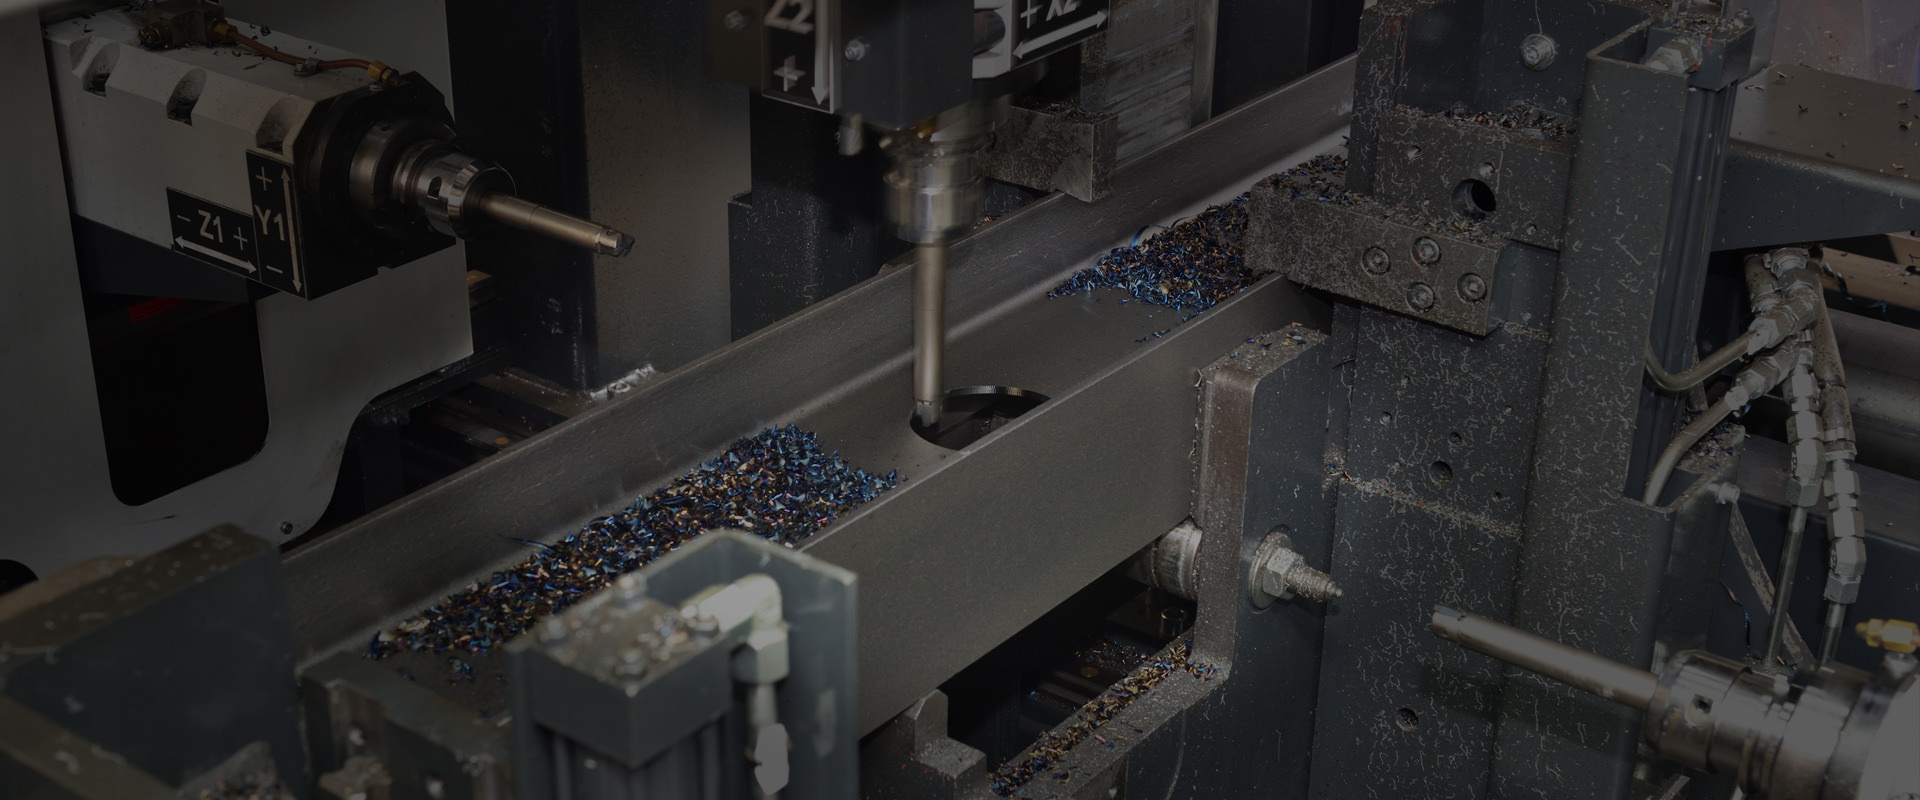 Tomrods Steel Stockholders